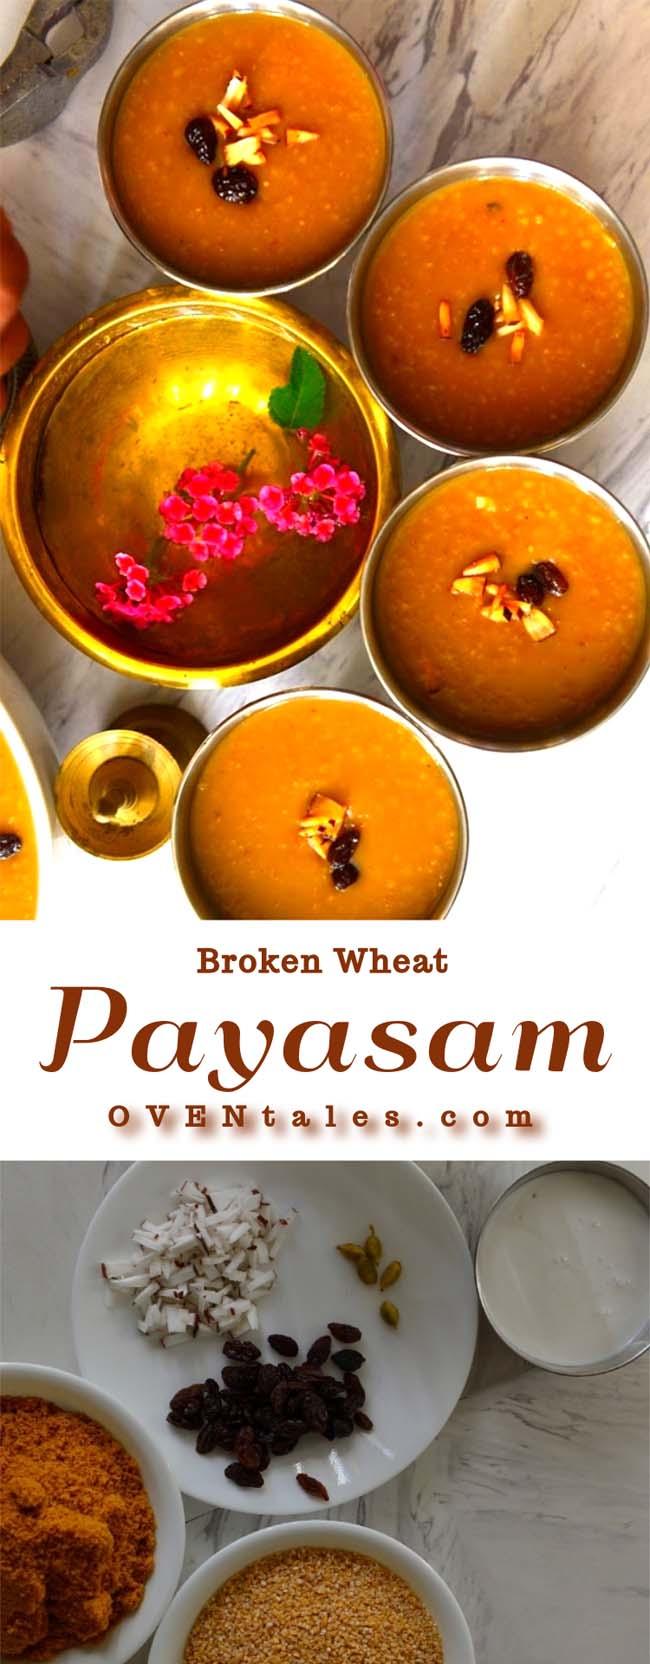 Broken wheat payasam or gothambu pradhaman